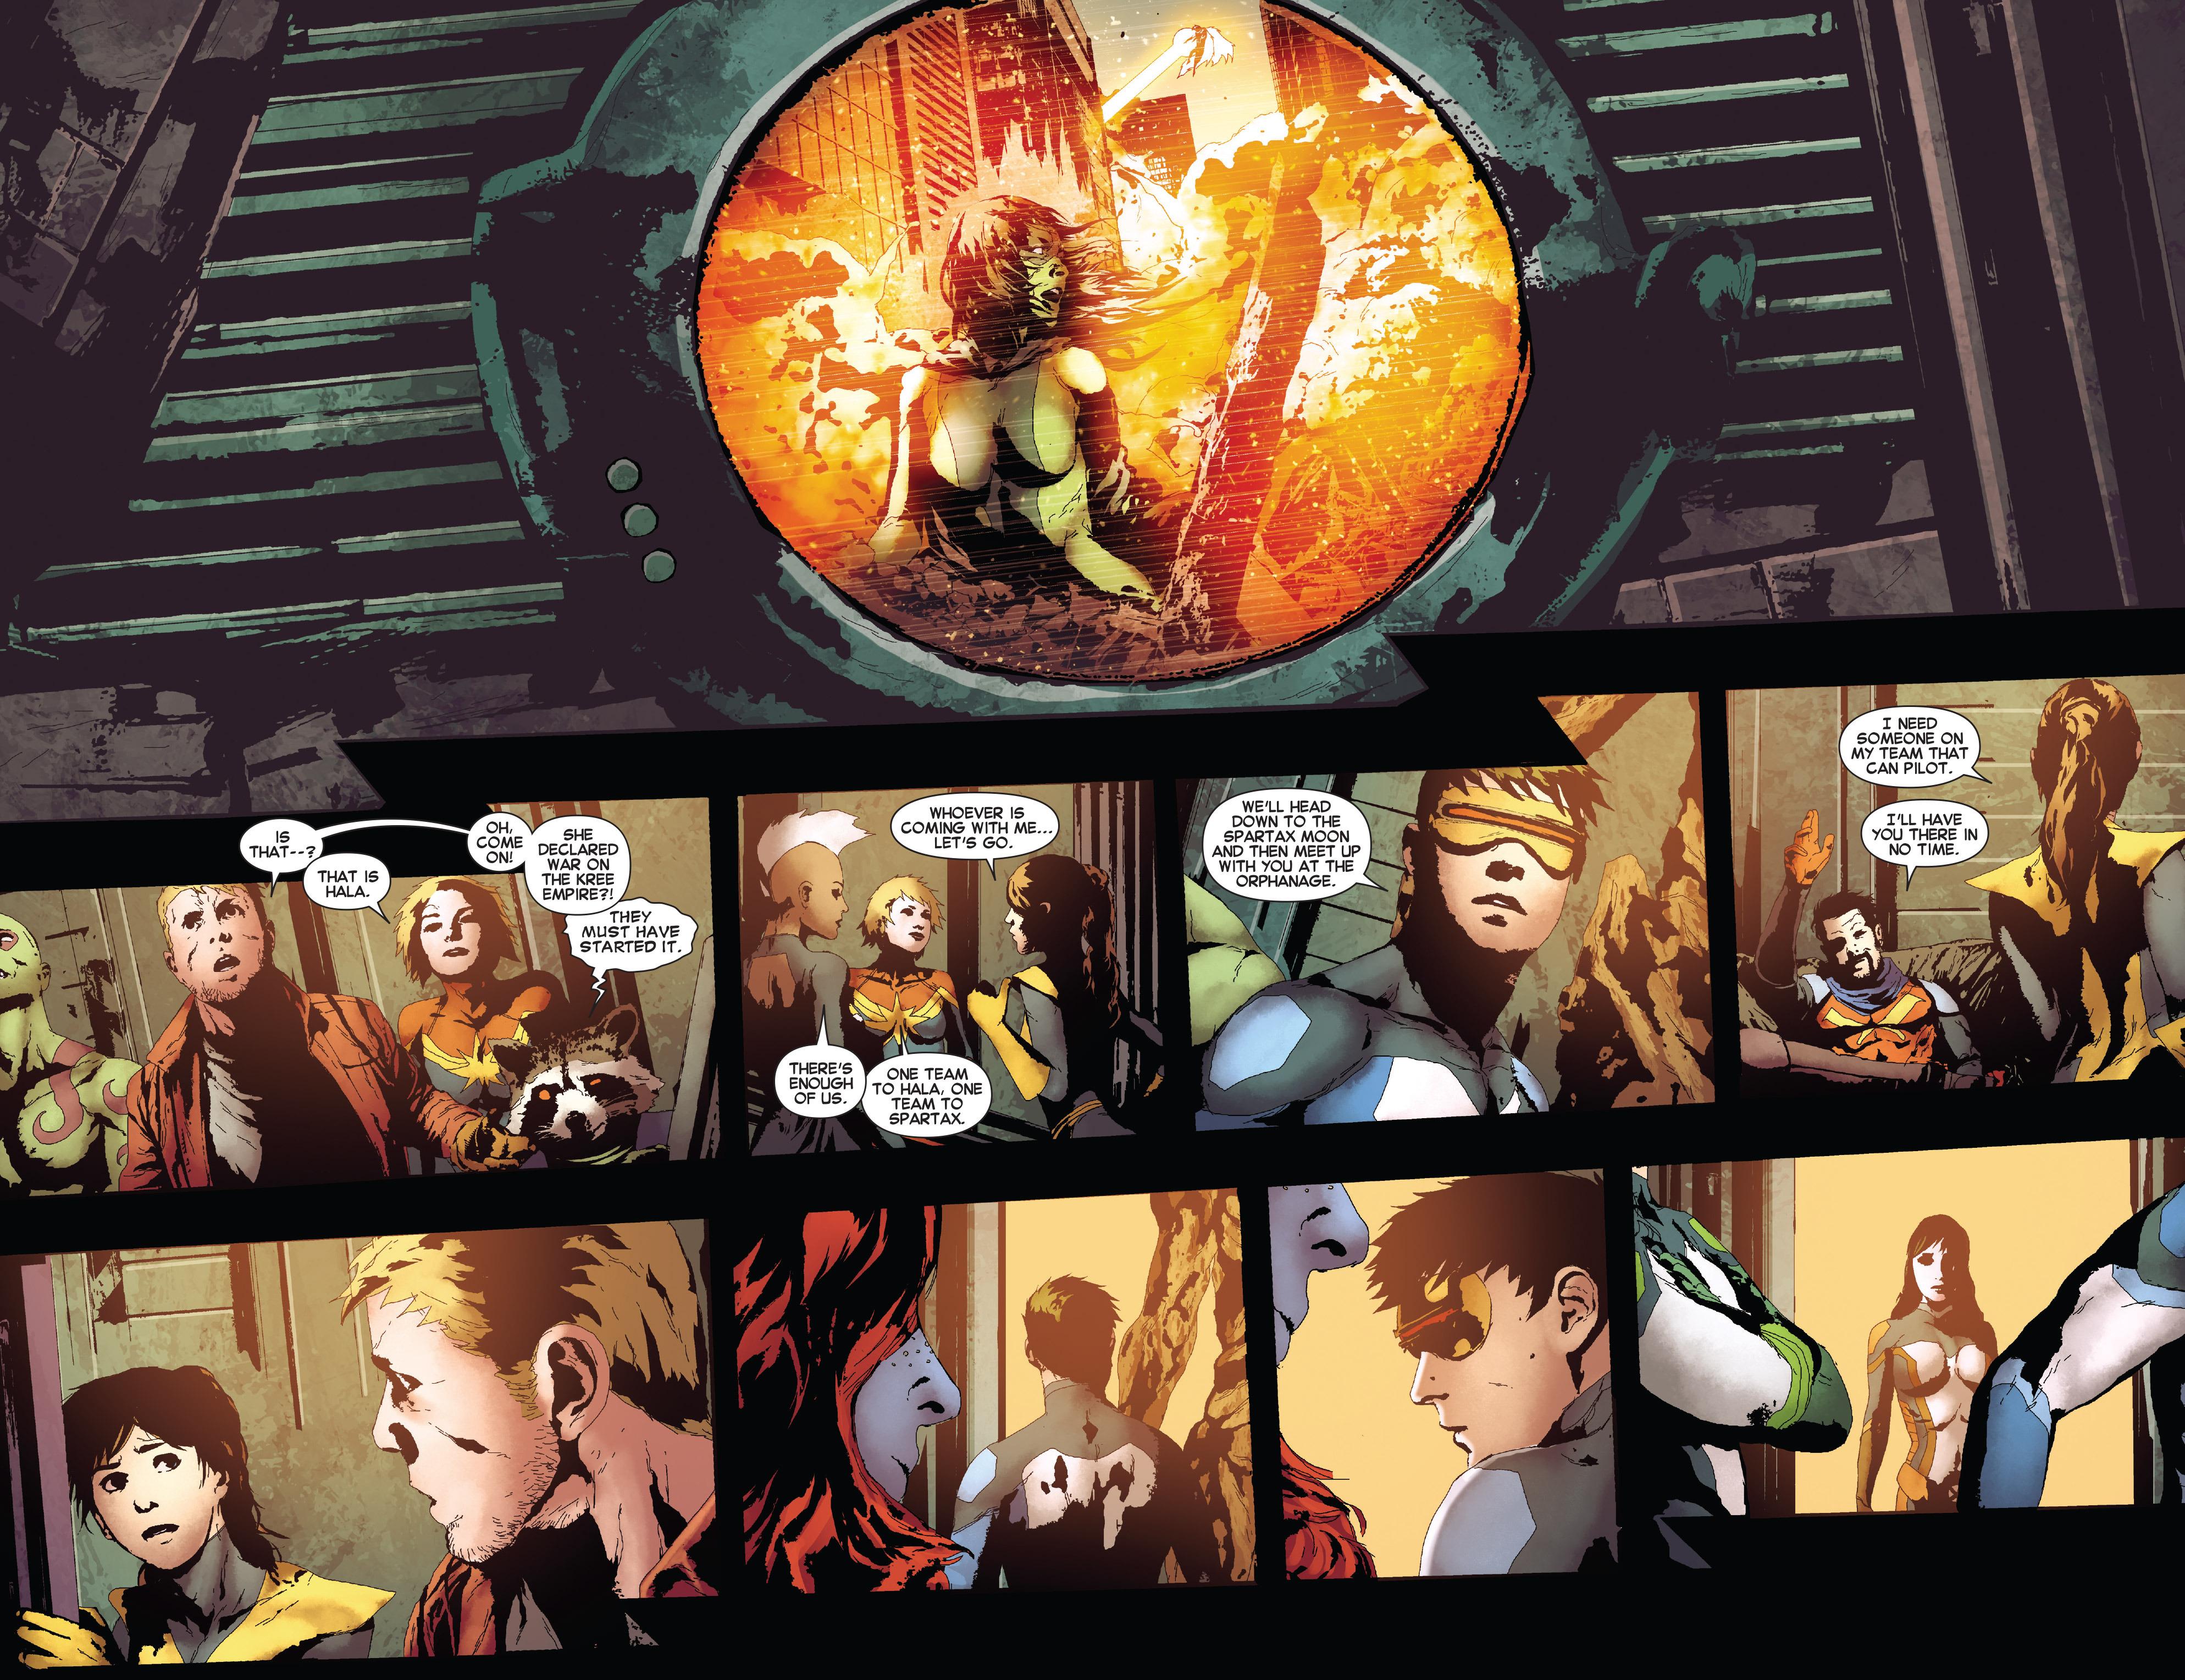 All-New X-Men (2013) chap 39 pic 14